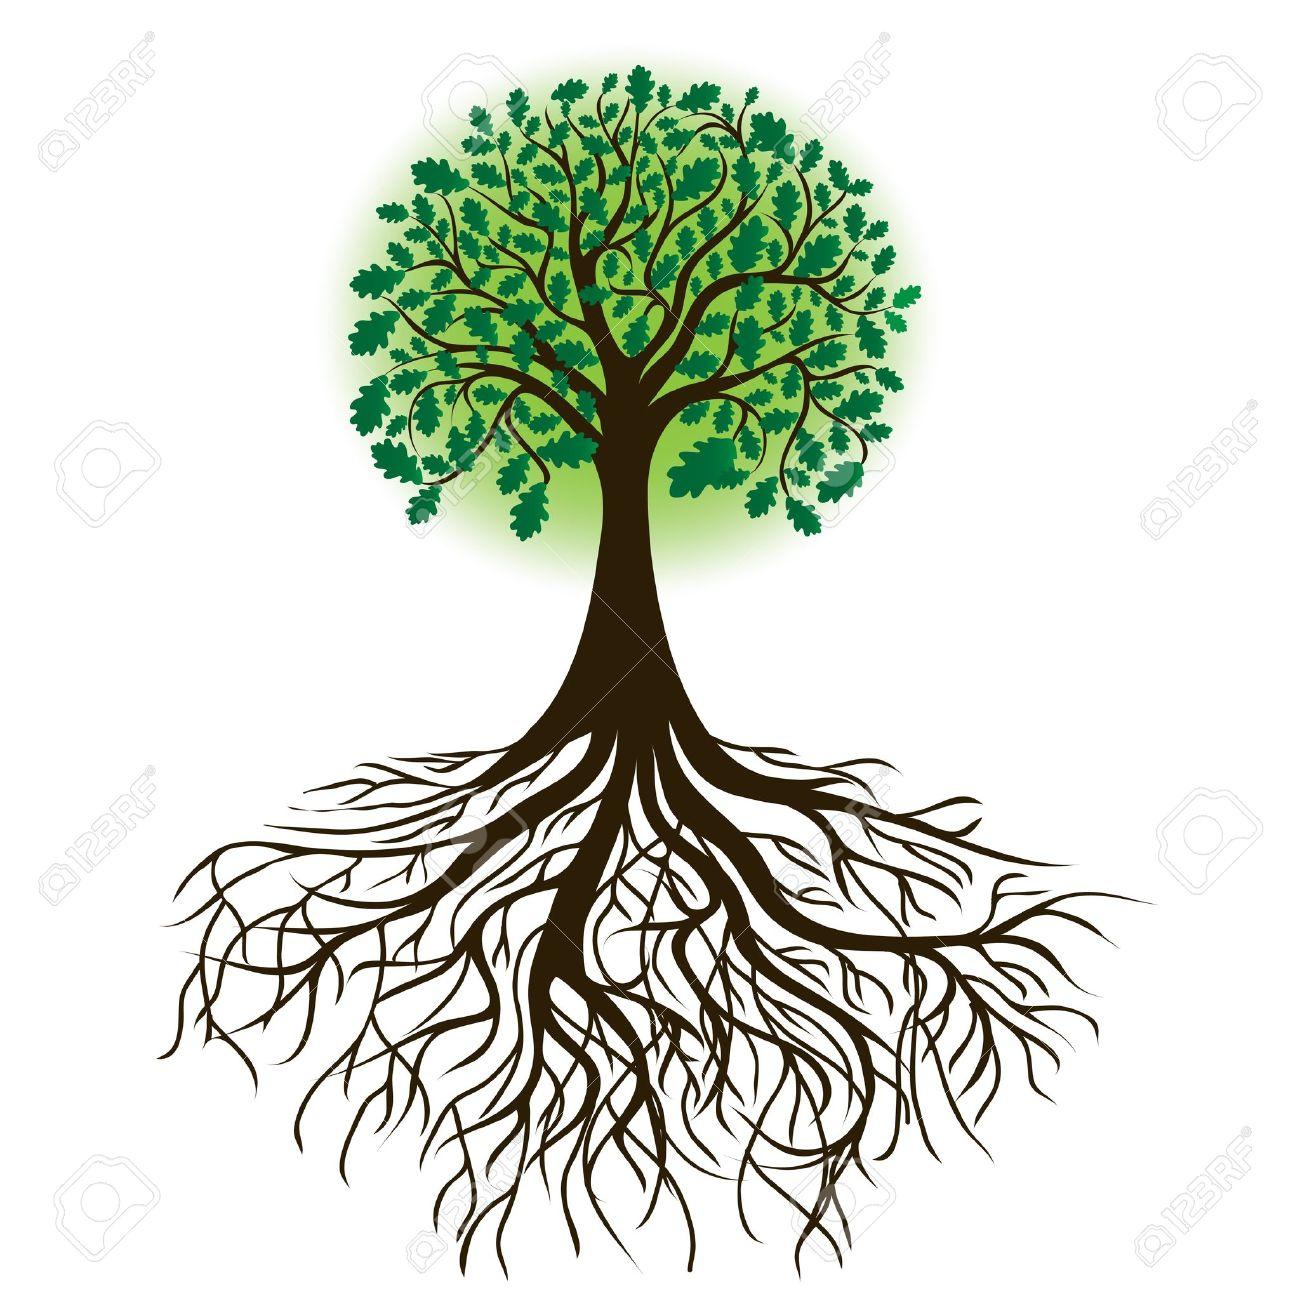 oak tree with roots and dense foliage royalty free cliparts vectors rh 123rf com oak tree vector clip art oak tree victorian boots